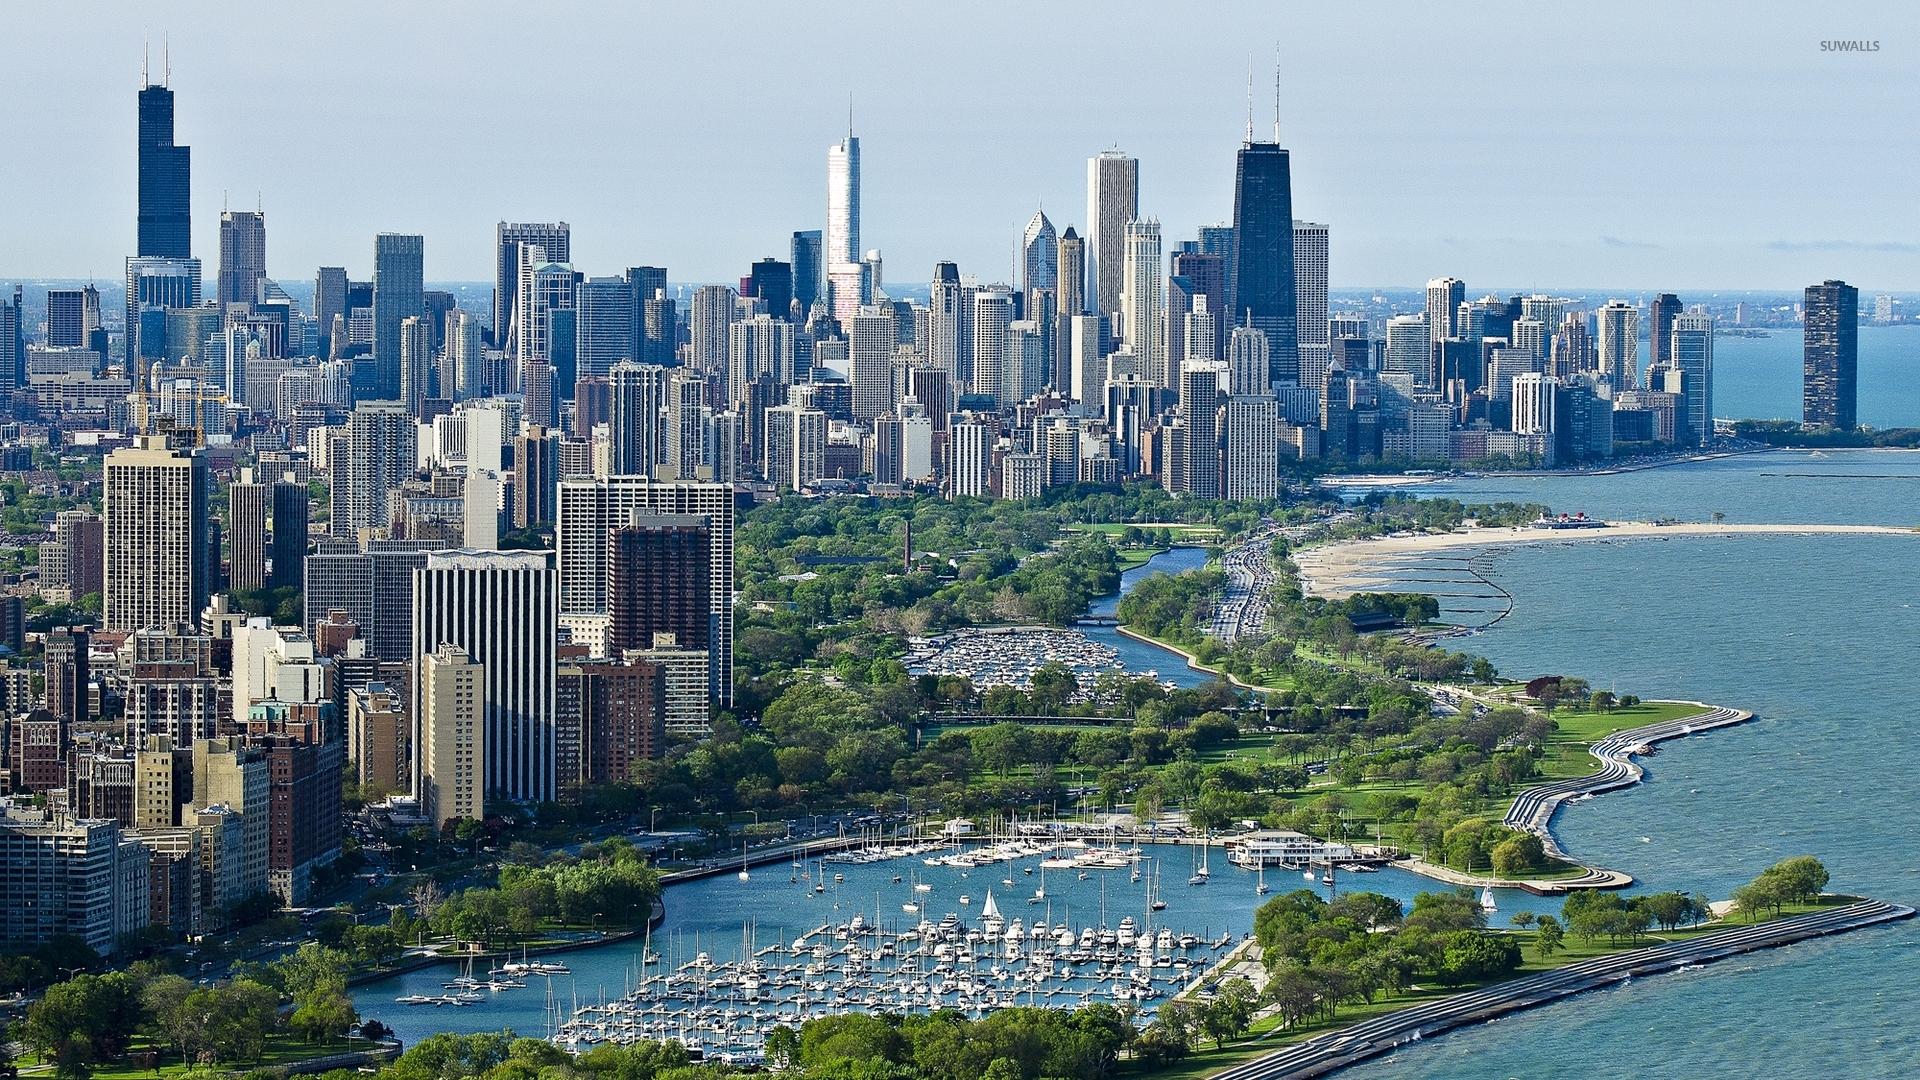 Chicago harbor wallpaper - World wallpapers - #49012